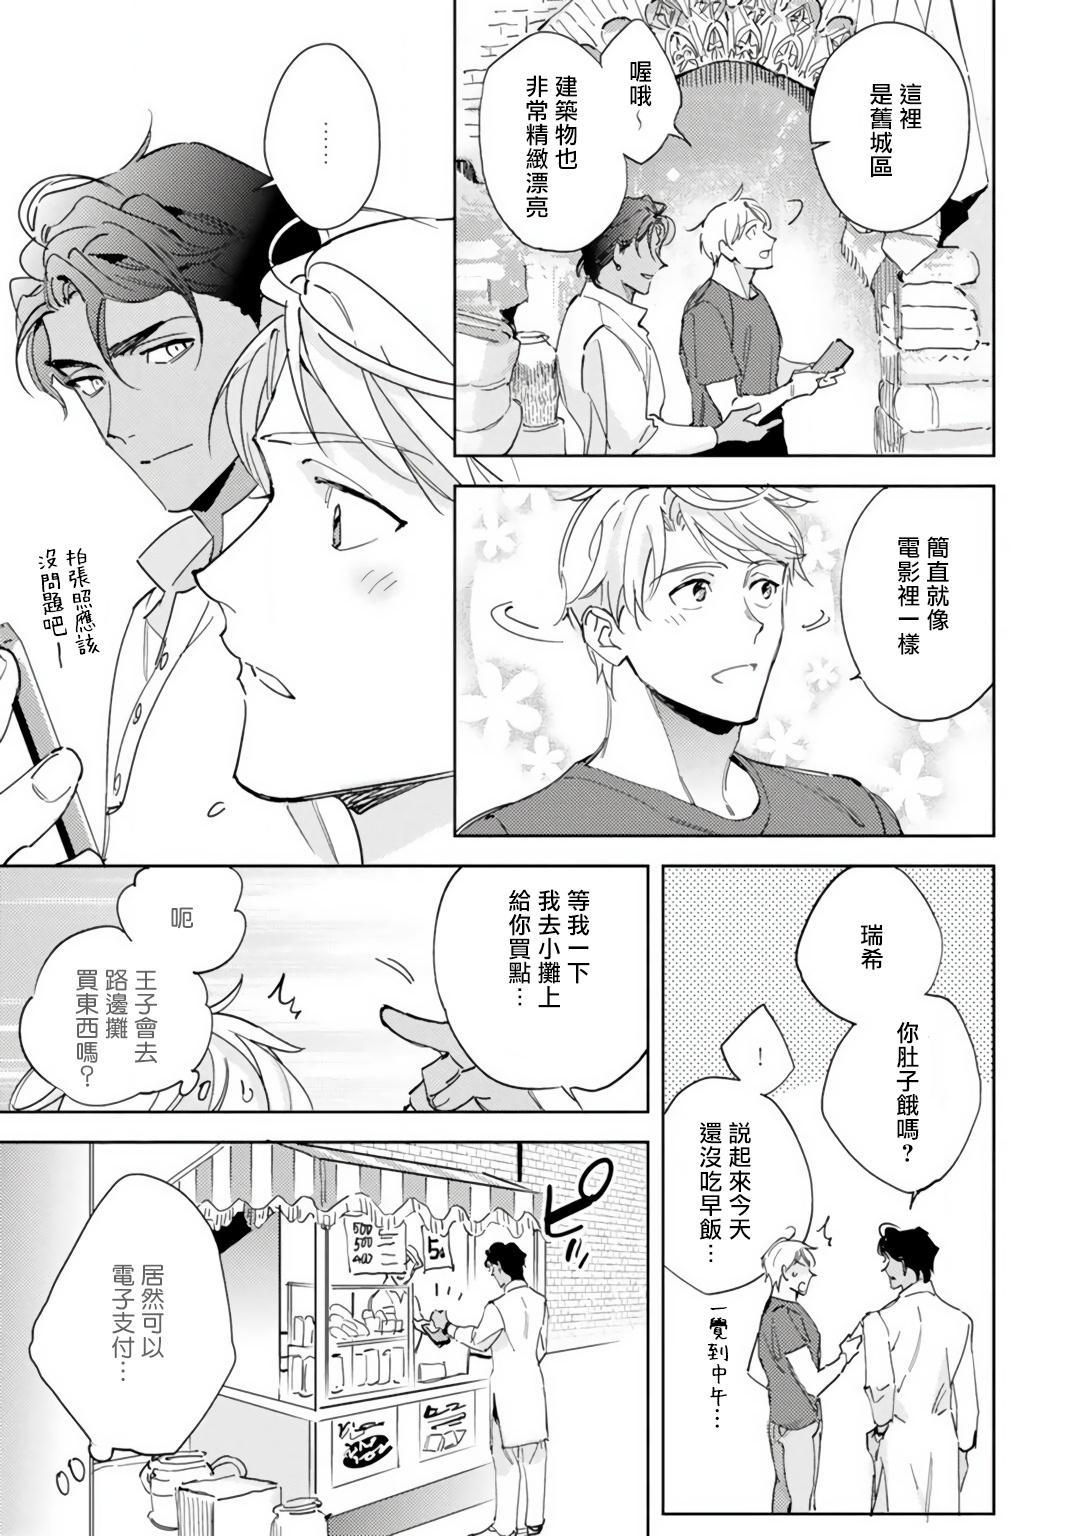 Amber Vanilla no Hanayome | 琥珀香草的新娘 Ch. 1-3 59